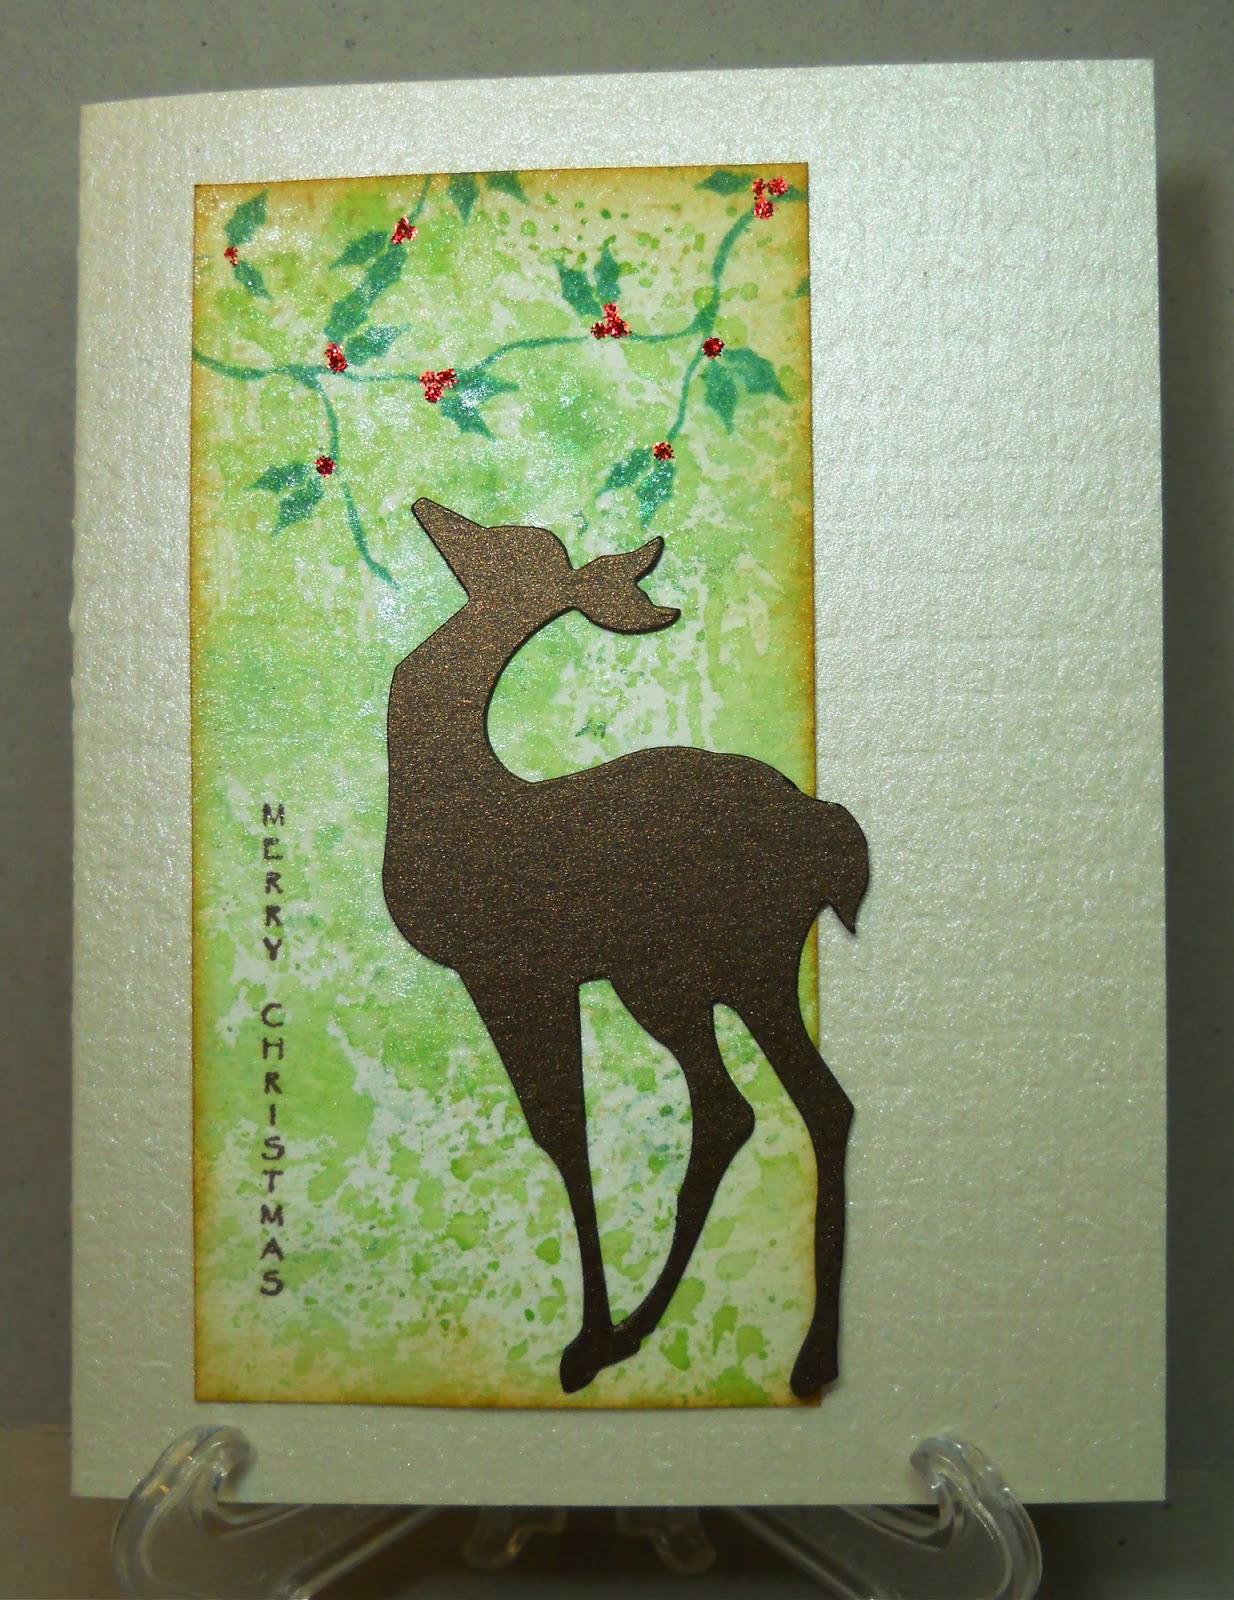 Gold Glitter Metallic Bronze /& Brown Glitter Christmas Reindeer Die Cuts 15 Count